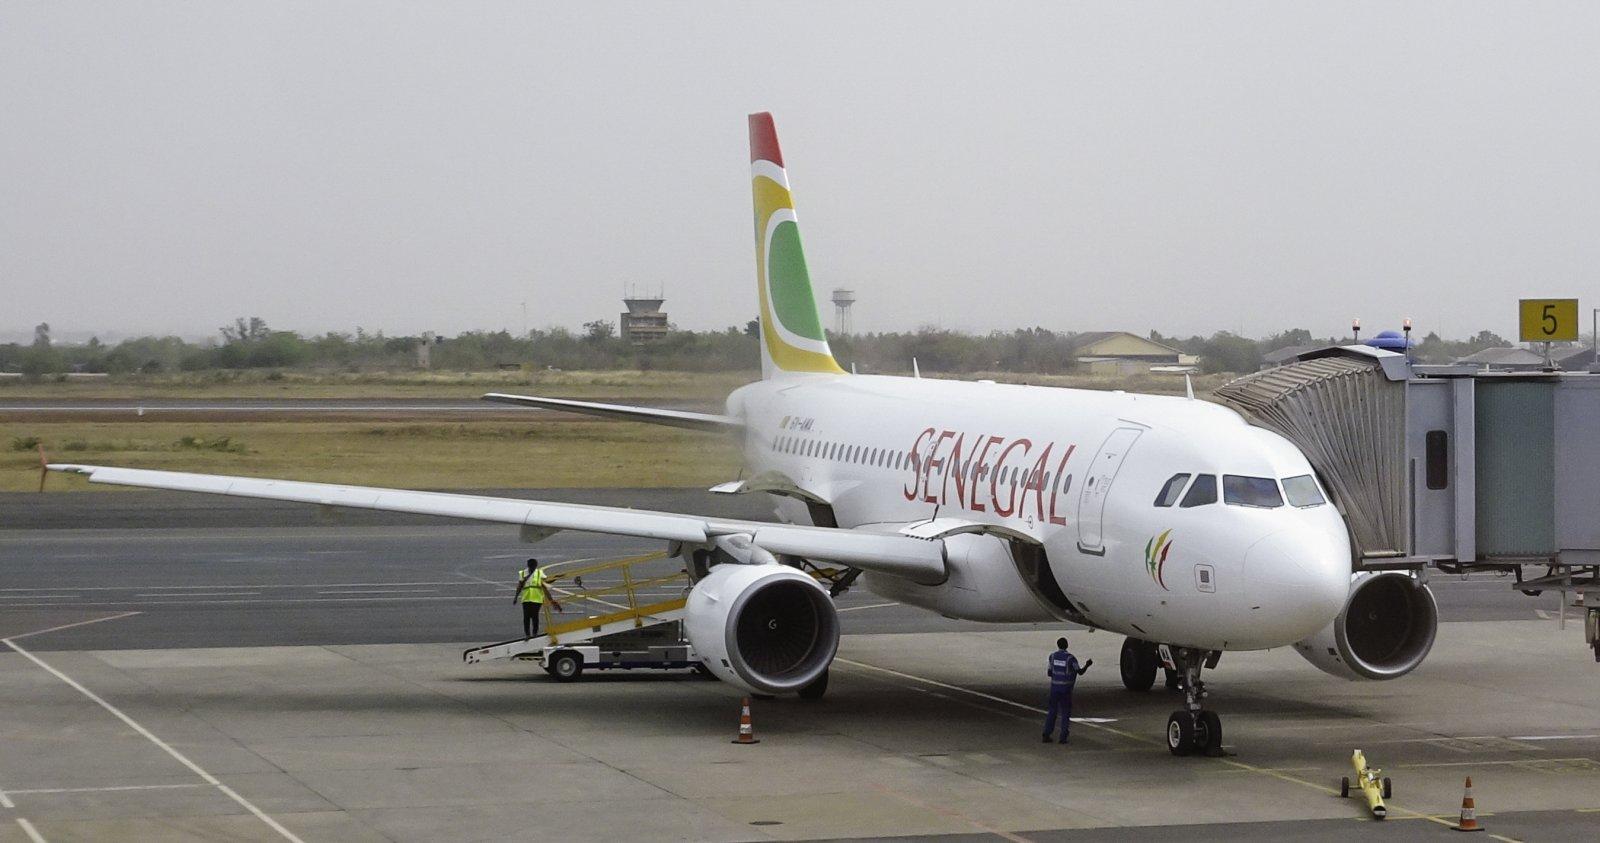 Air Senegal Boeing 737-319-112 6V-AMA